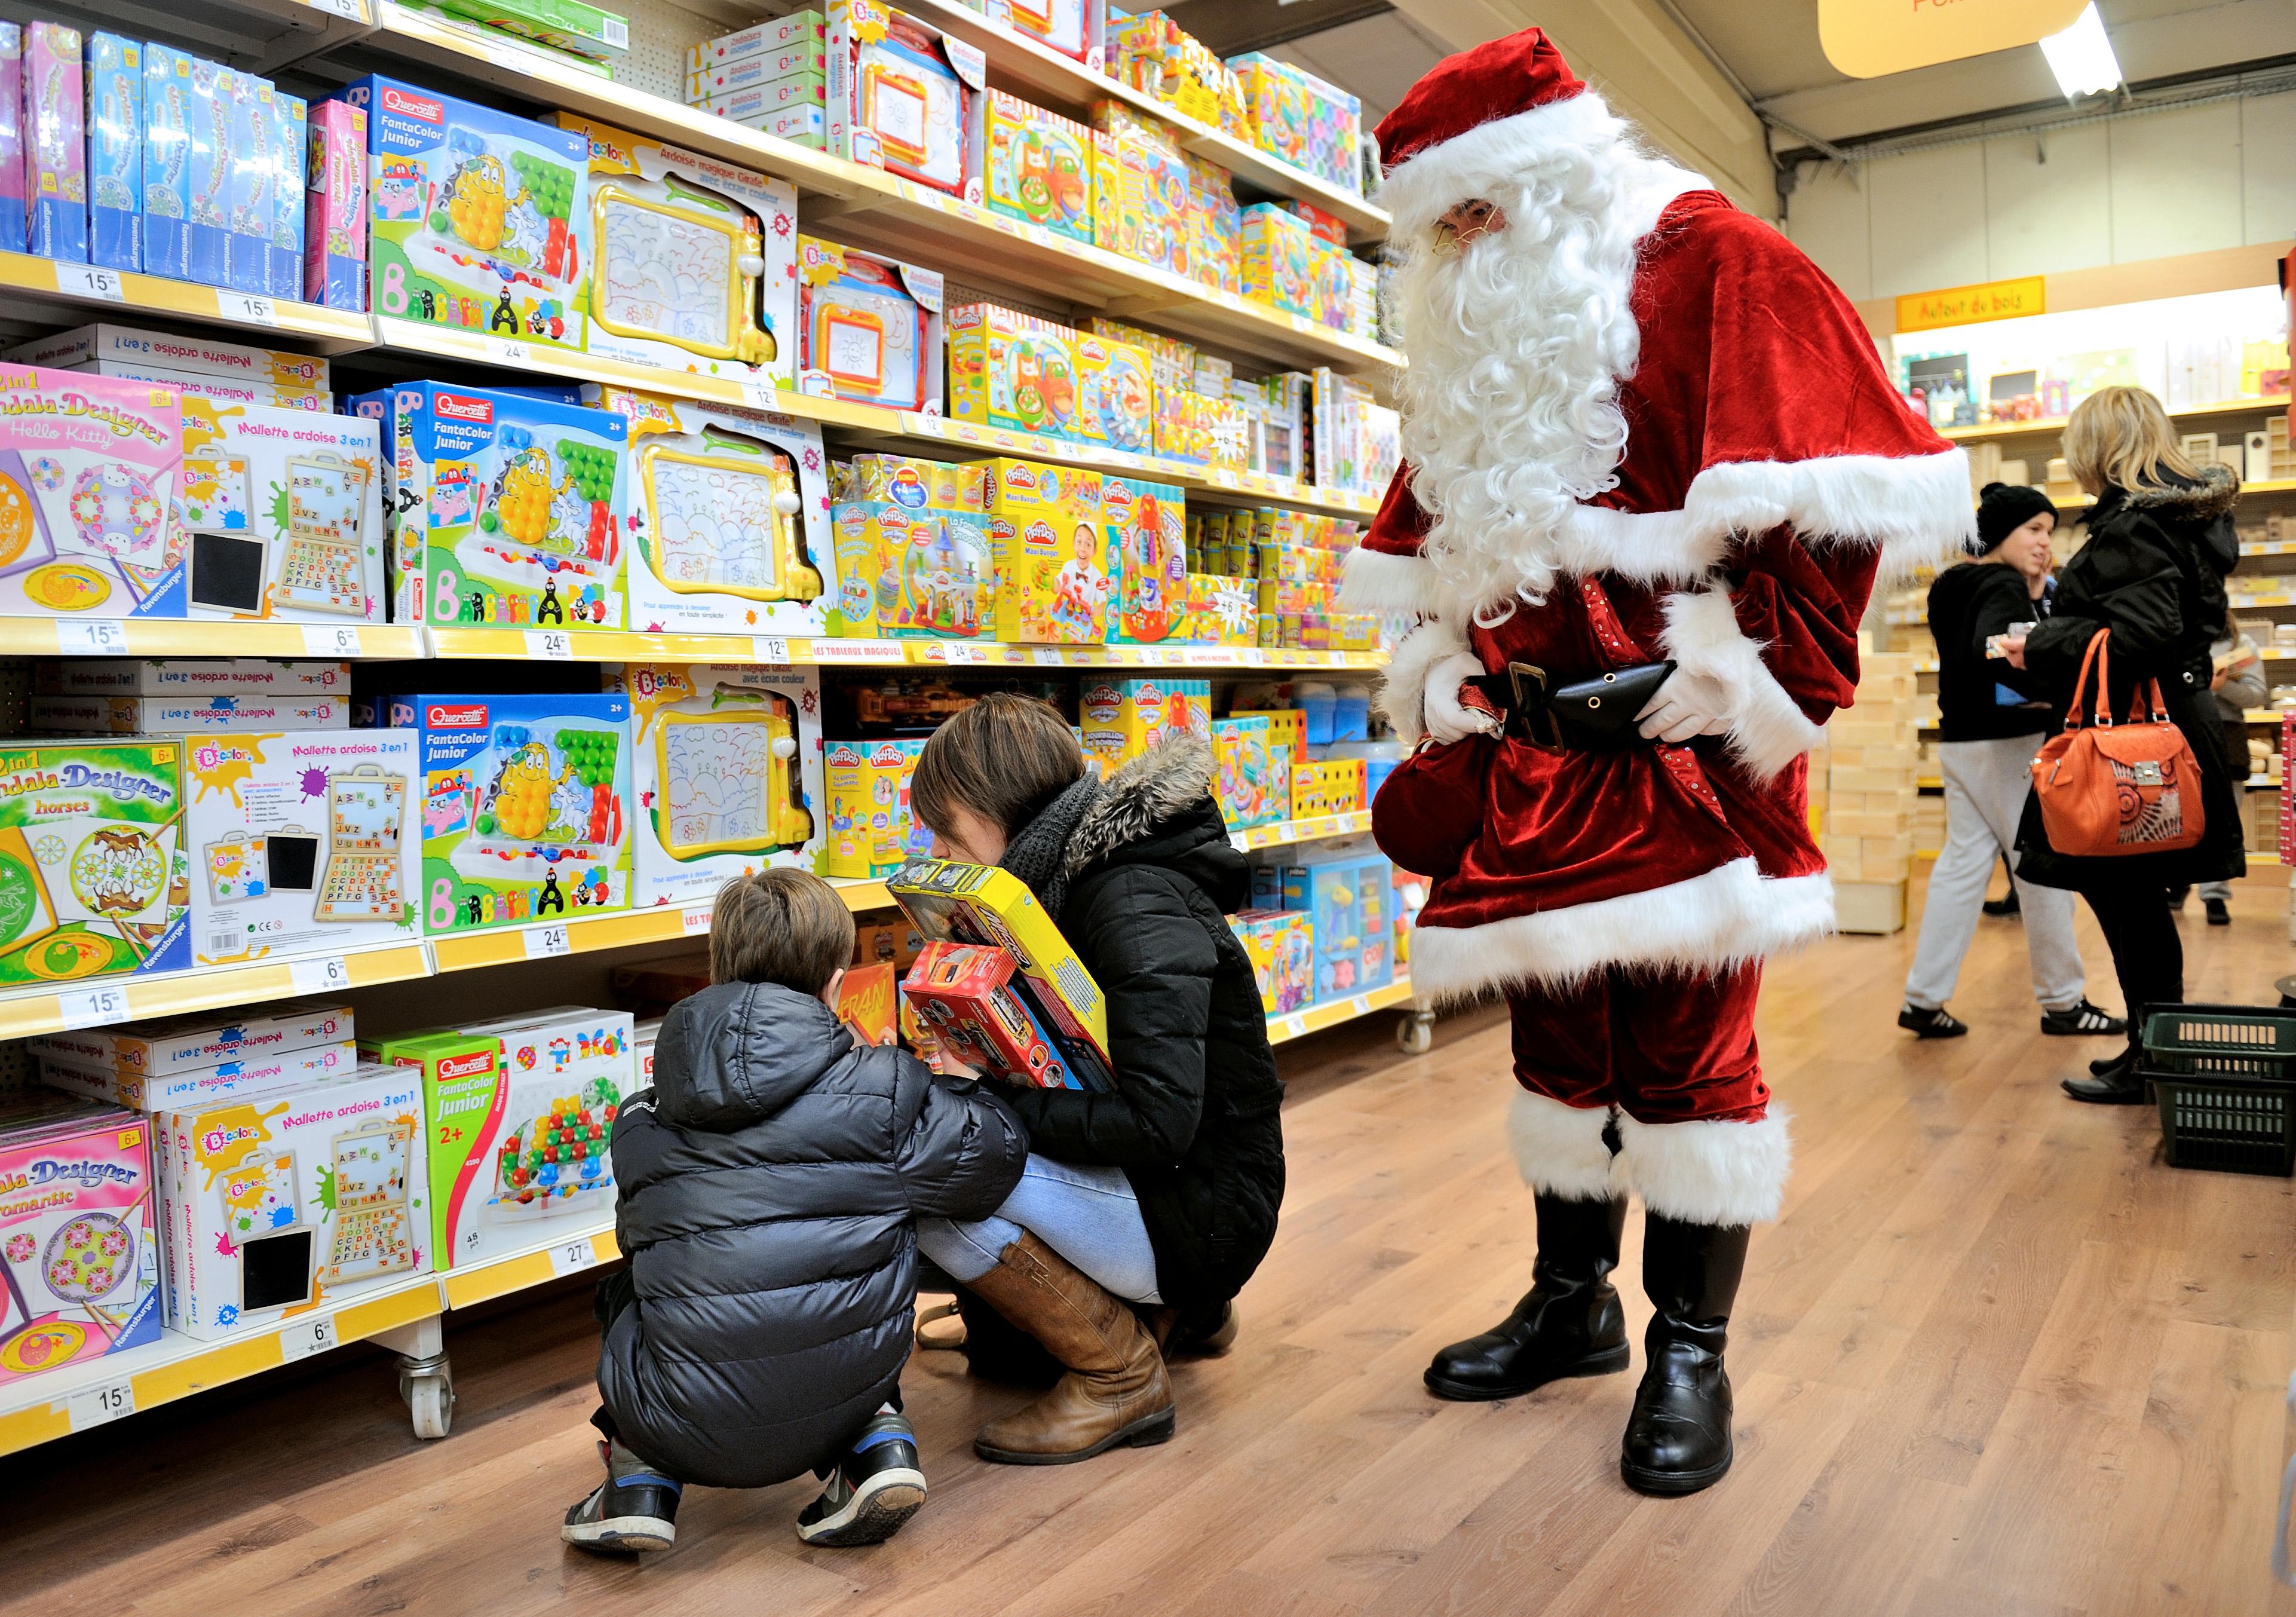 I Regali Piu Desiderati Dai Bambini A Natale Foto